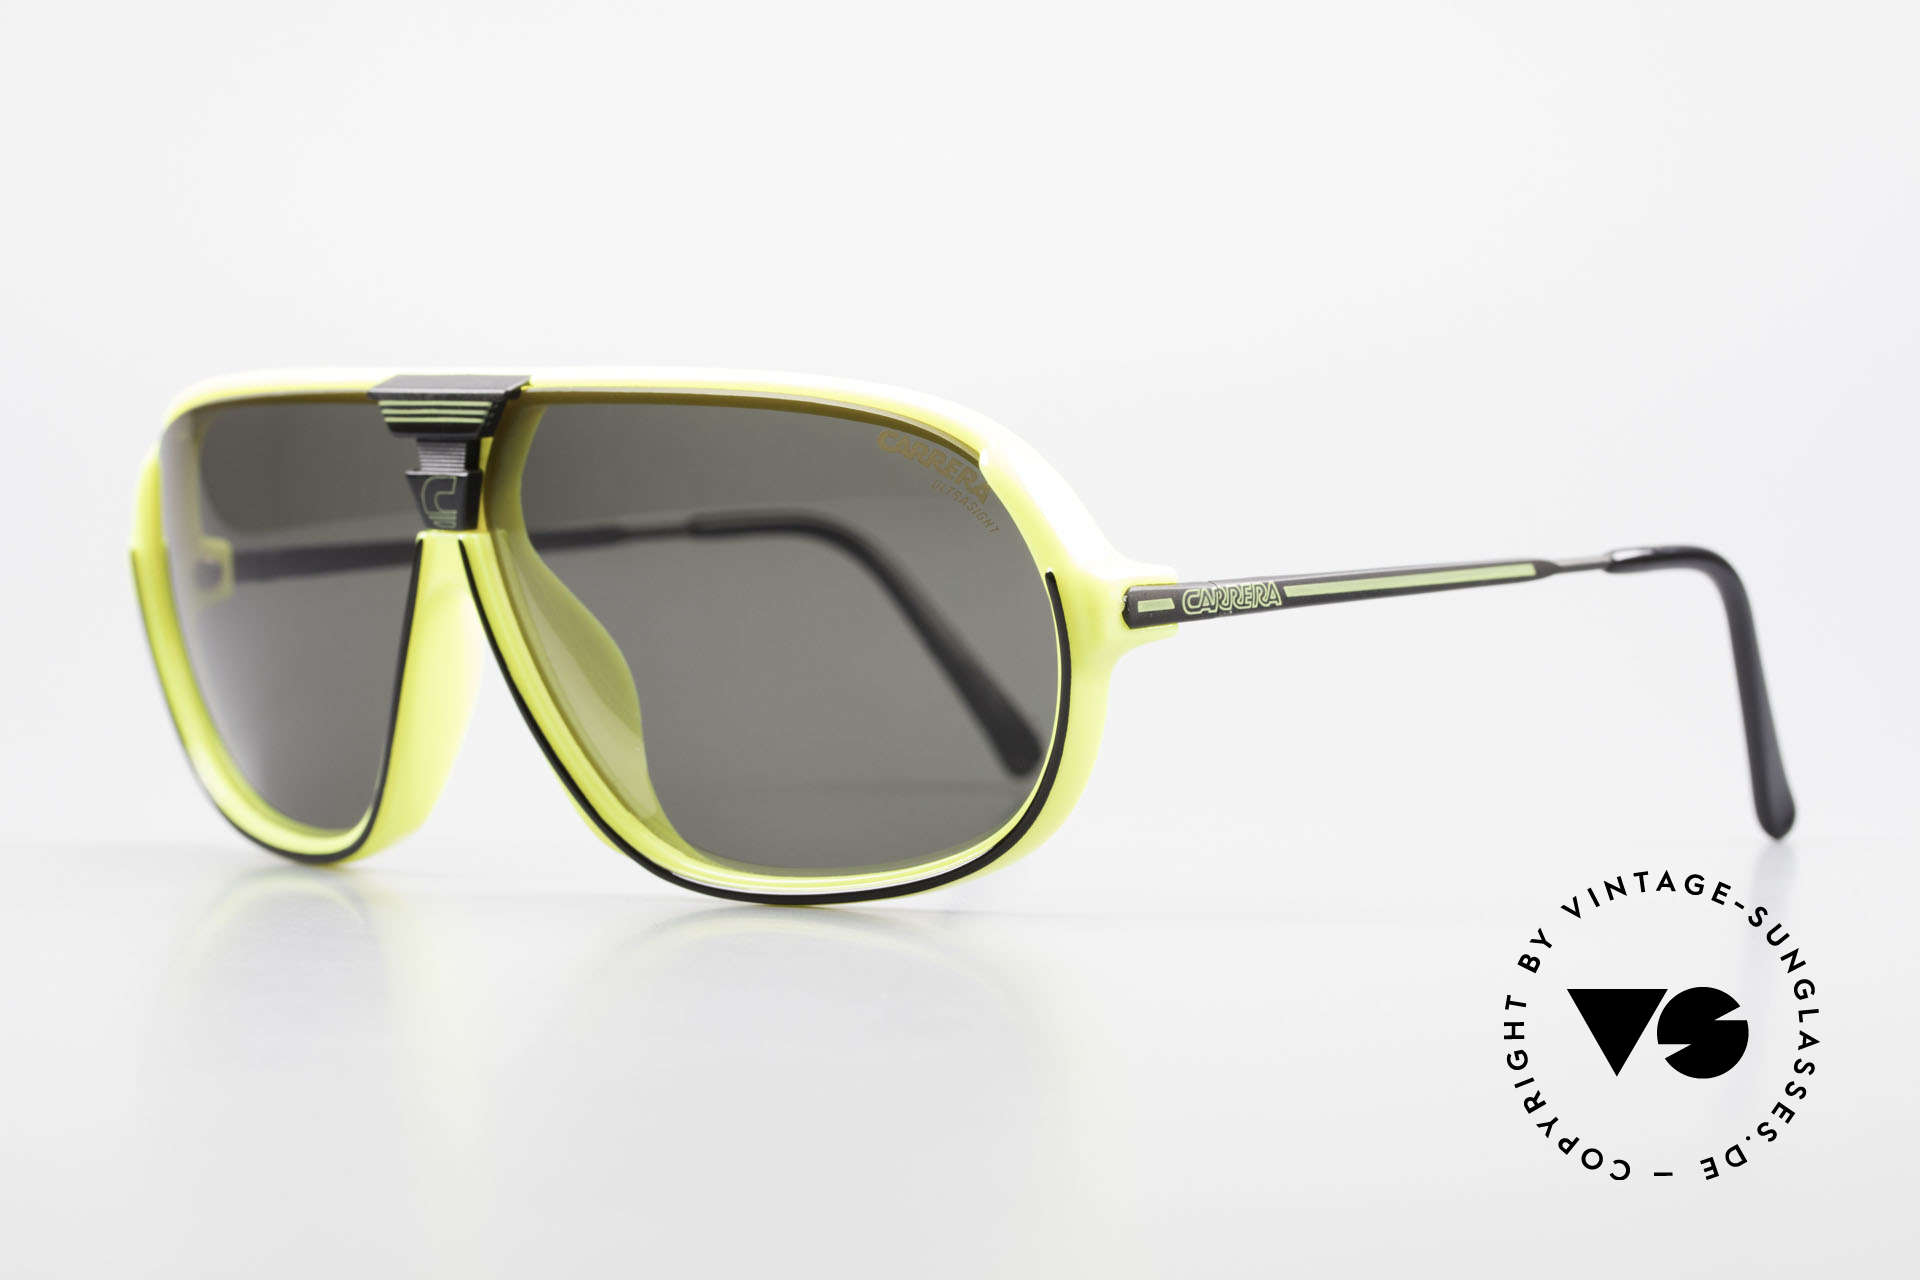 Carrera 5416 80's Shades Polarized Lenses, 1x ULTRAPOL (polarized) and 1x ULTRASIGHT, Made for Men